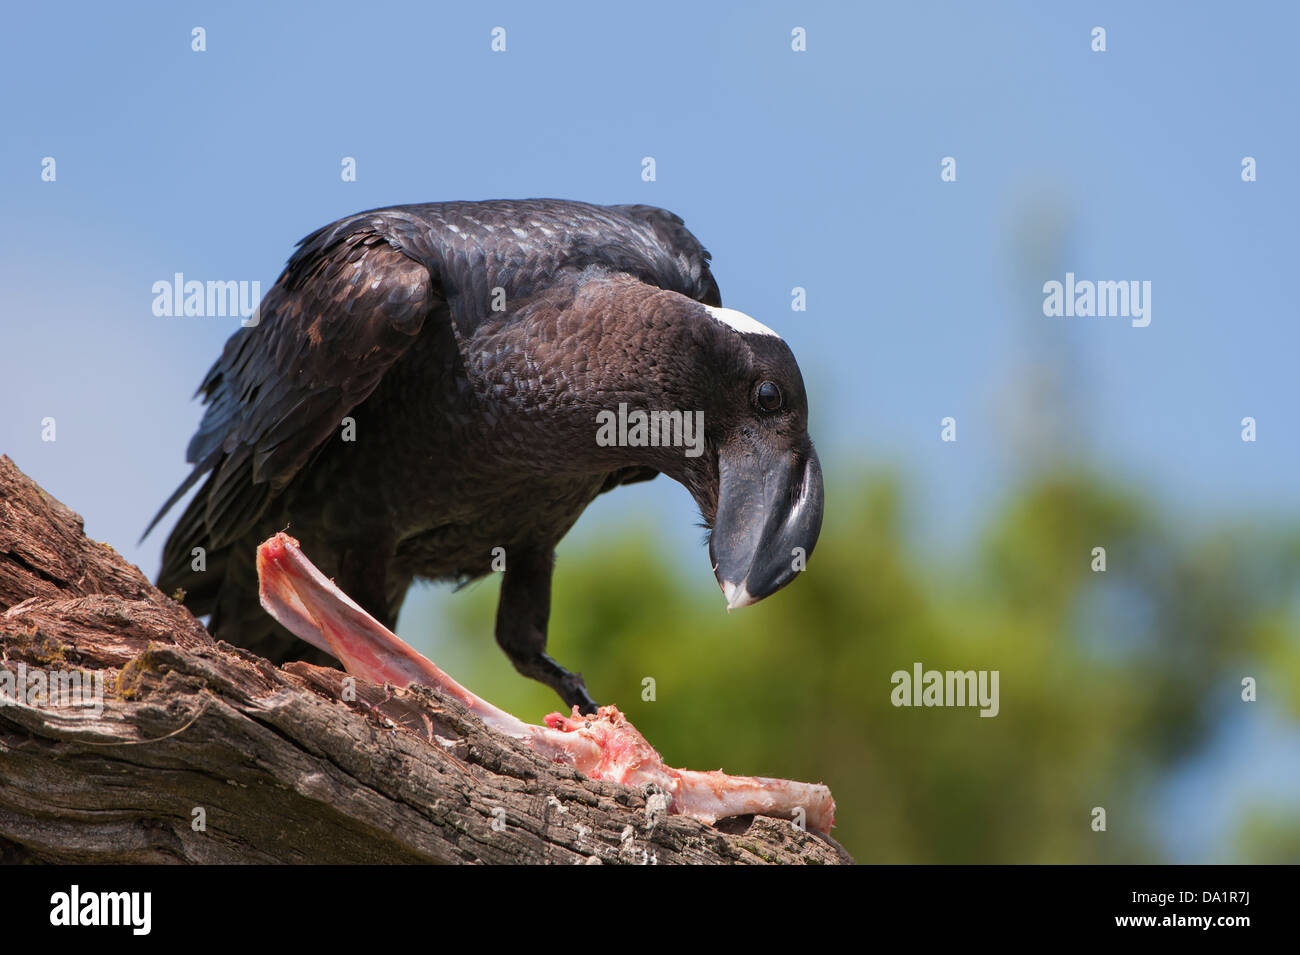 Thick-billed Raven (Corvus crassirostris) feeding on a carcass, Simien mountains national park,Ethiopia - Stock Image